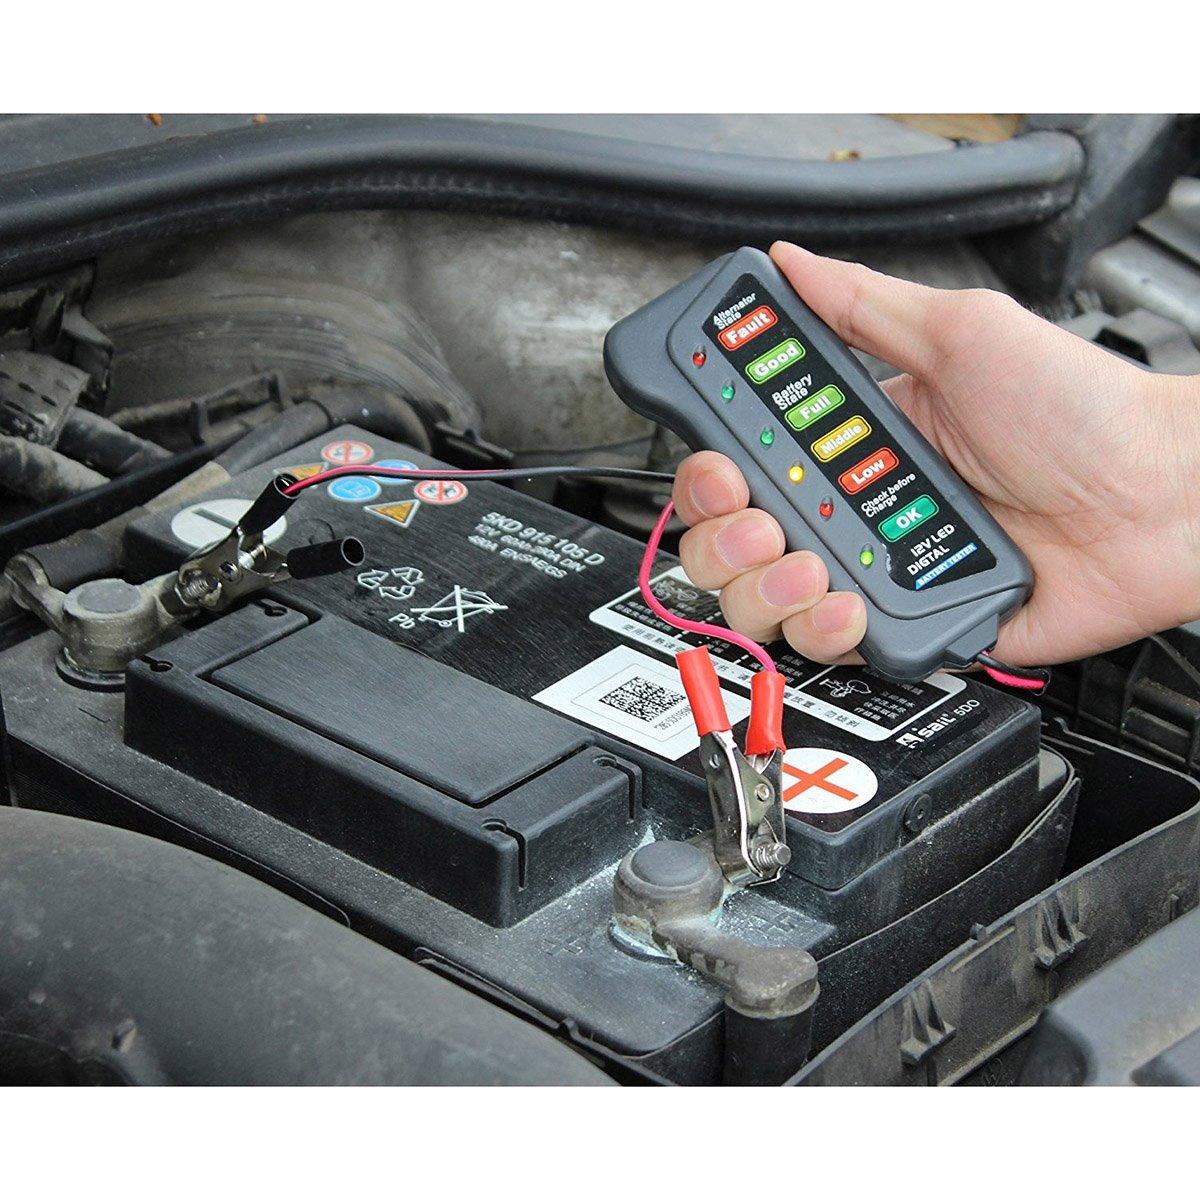 WINOMO 12V Auto Batterie Tester Lichtmaschine Ladeger/ä t f/ü r Automotive Motorrad U4143036248O85352